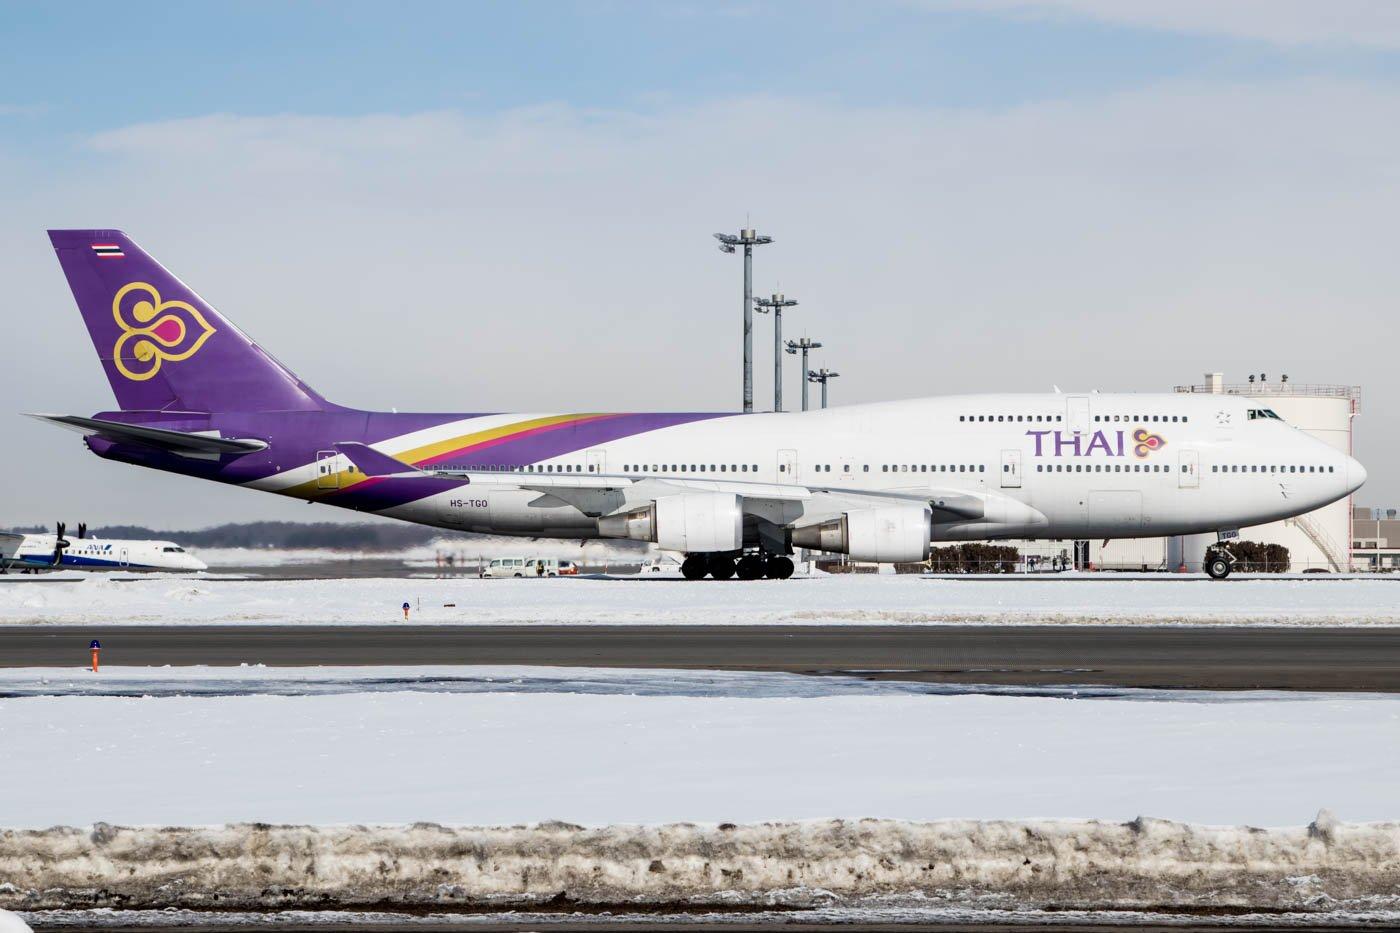 Thai Airways 747 at Sapporo New Chitose